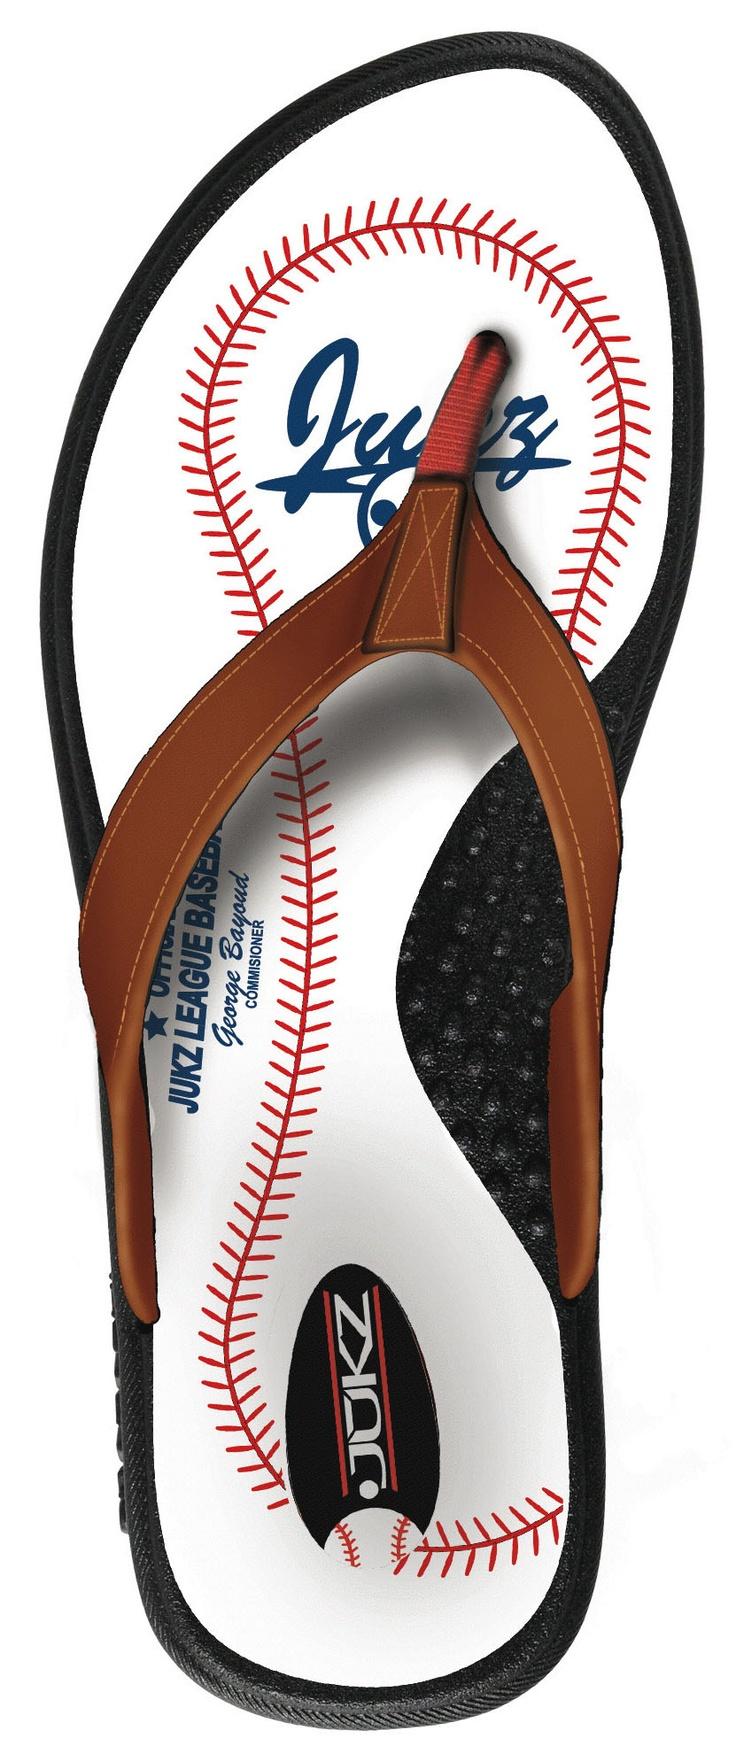 Baseball Flip Flops / Baseball Sandals / Baseball Shoes from Jukz Shoes!